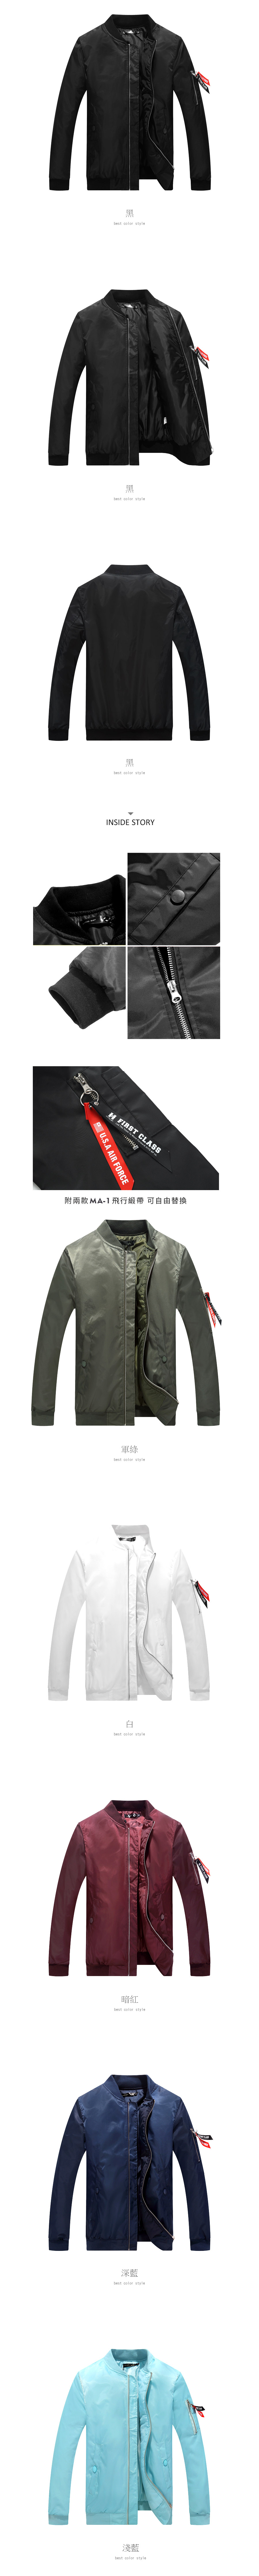 MA-1.鋪厚棉保暖款.情侶外套